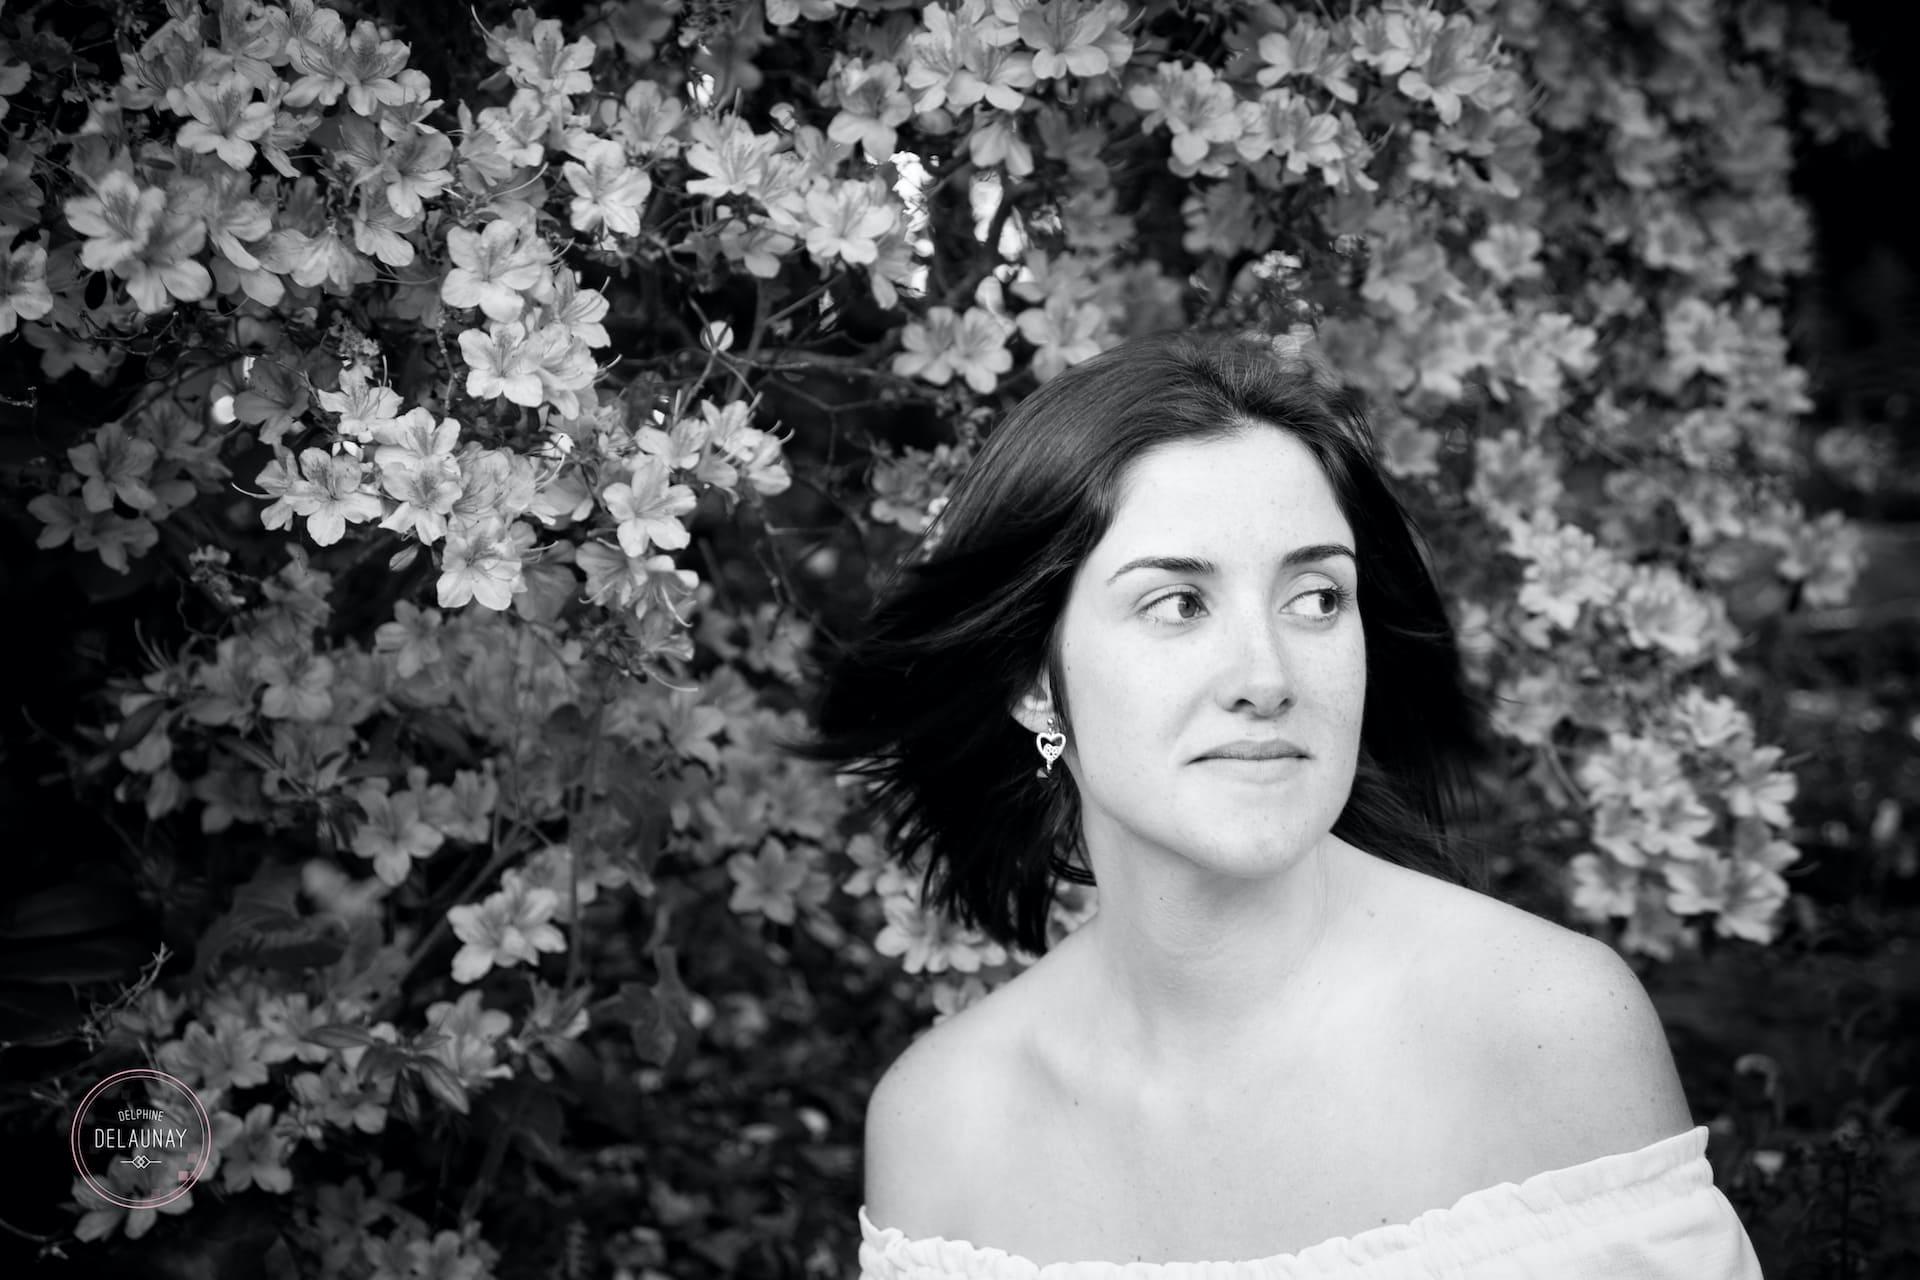 delphine-delaunay-photographe-savenay-famille-13